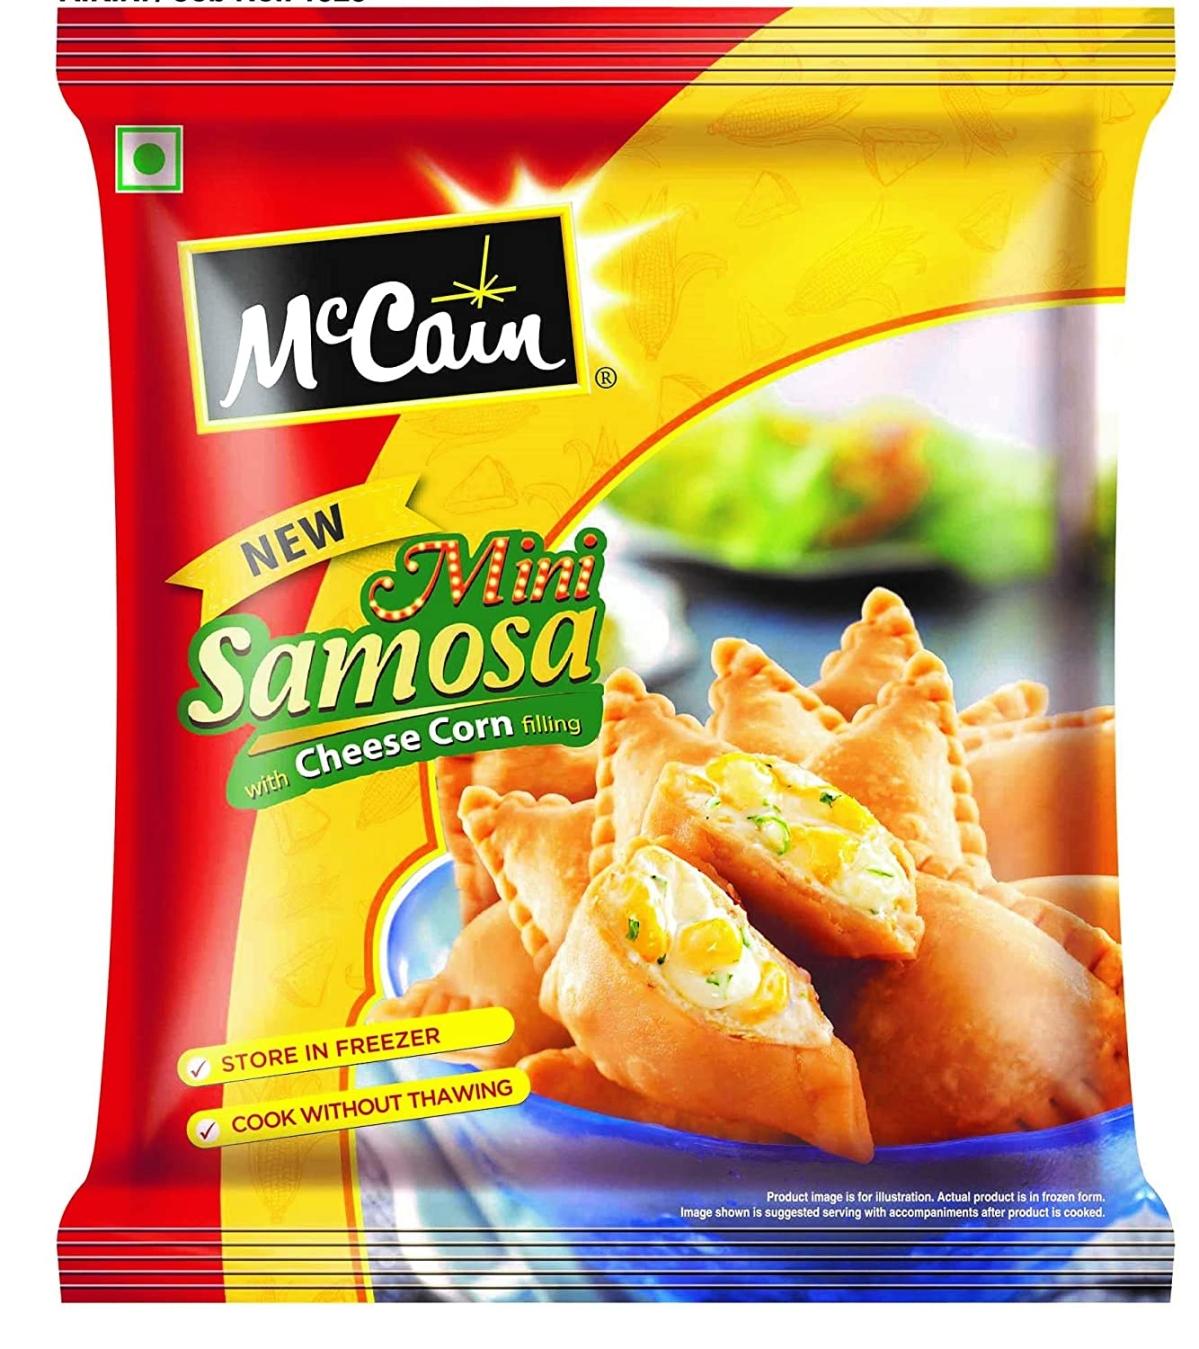 McCain ready to cook samosa